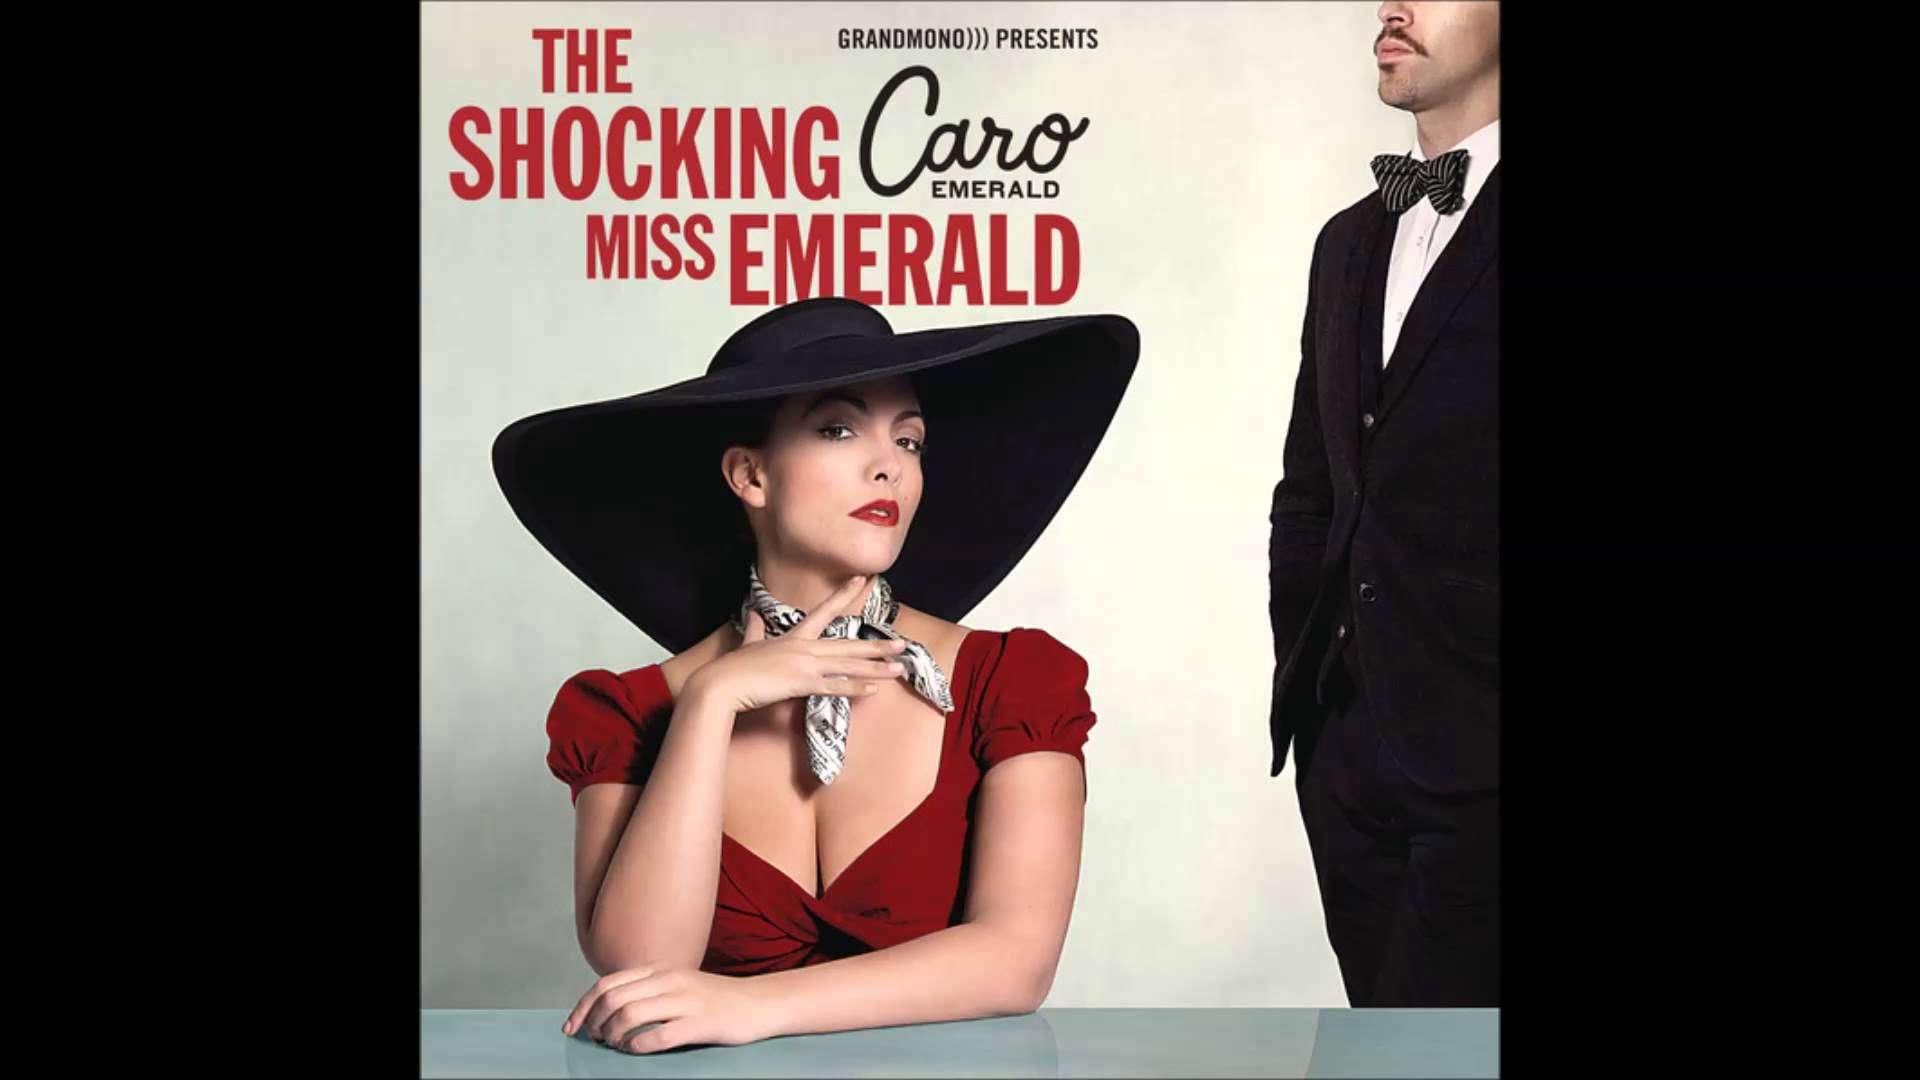 Caro Emerald - Coming Back As a Man - YouTube